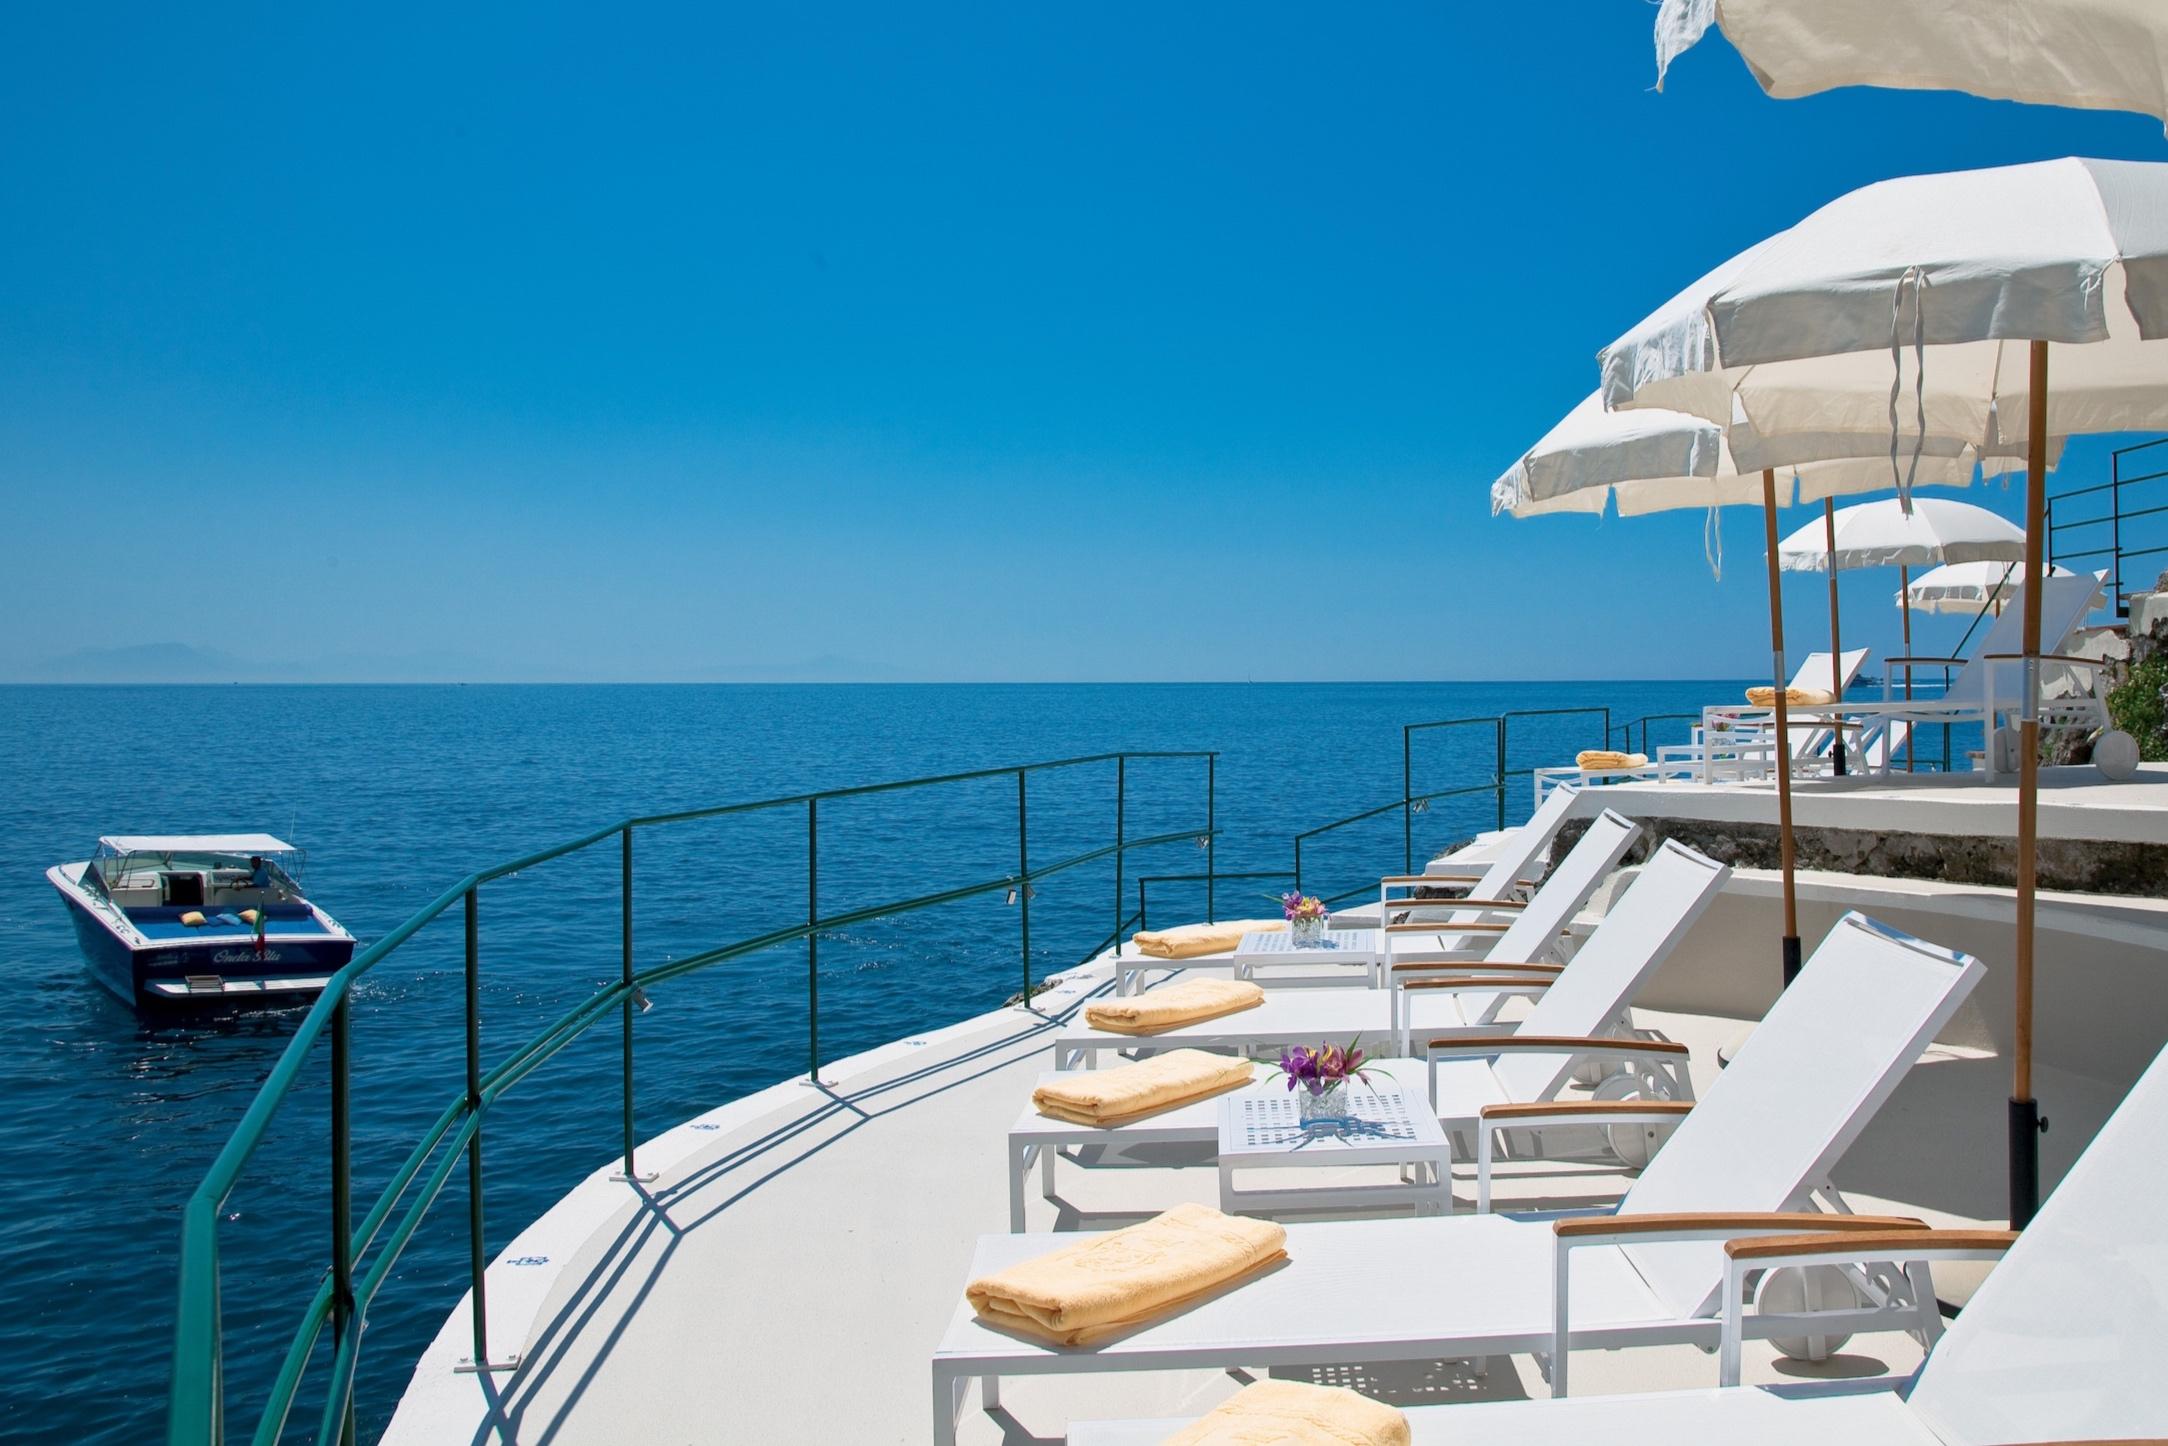 palazzo-avino-clubhouse-by-the-sea-beach-platform-2.jpg